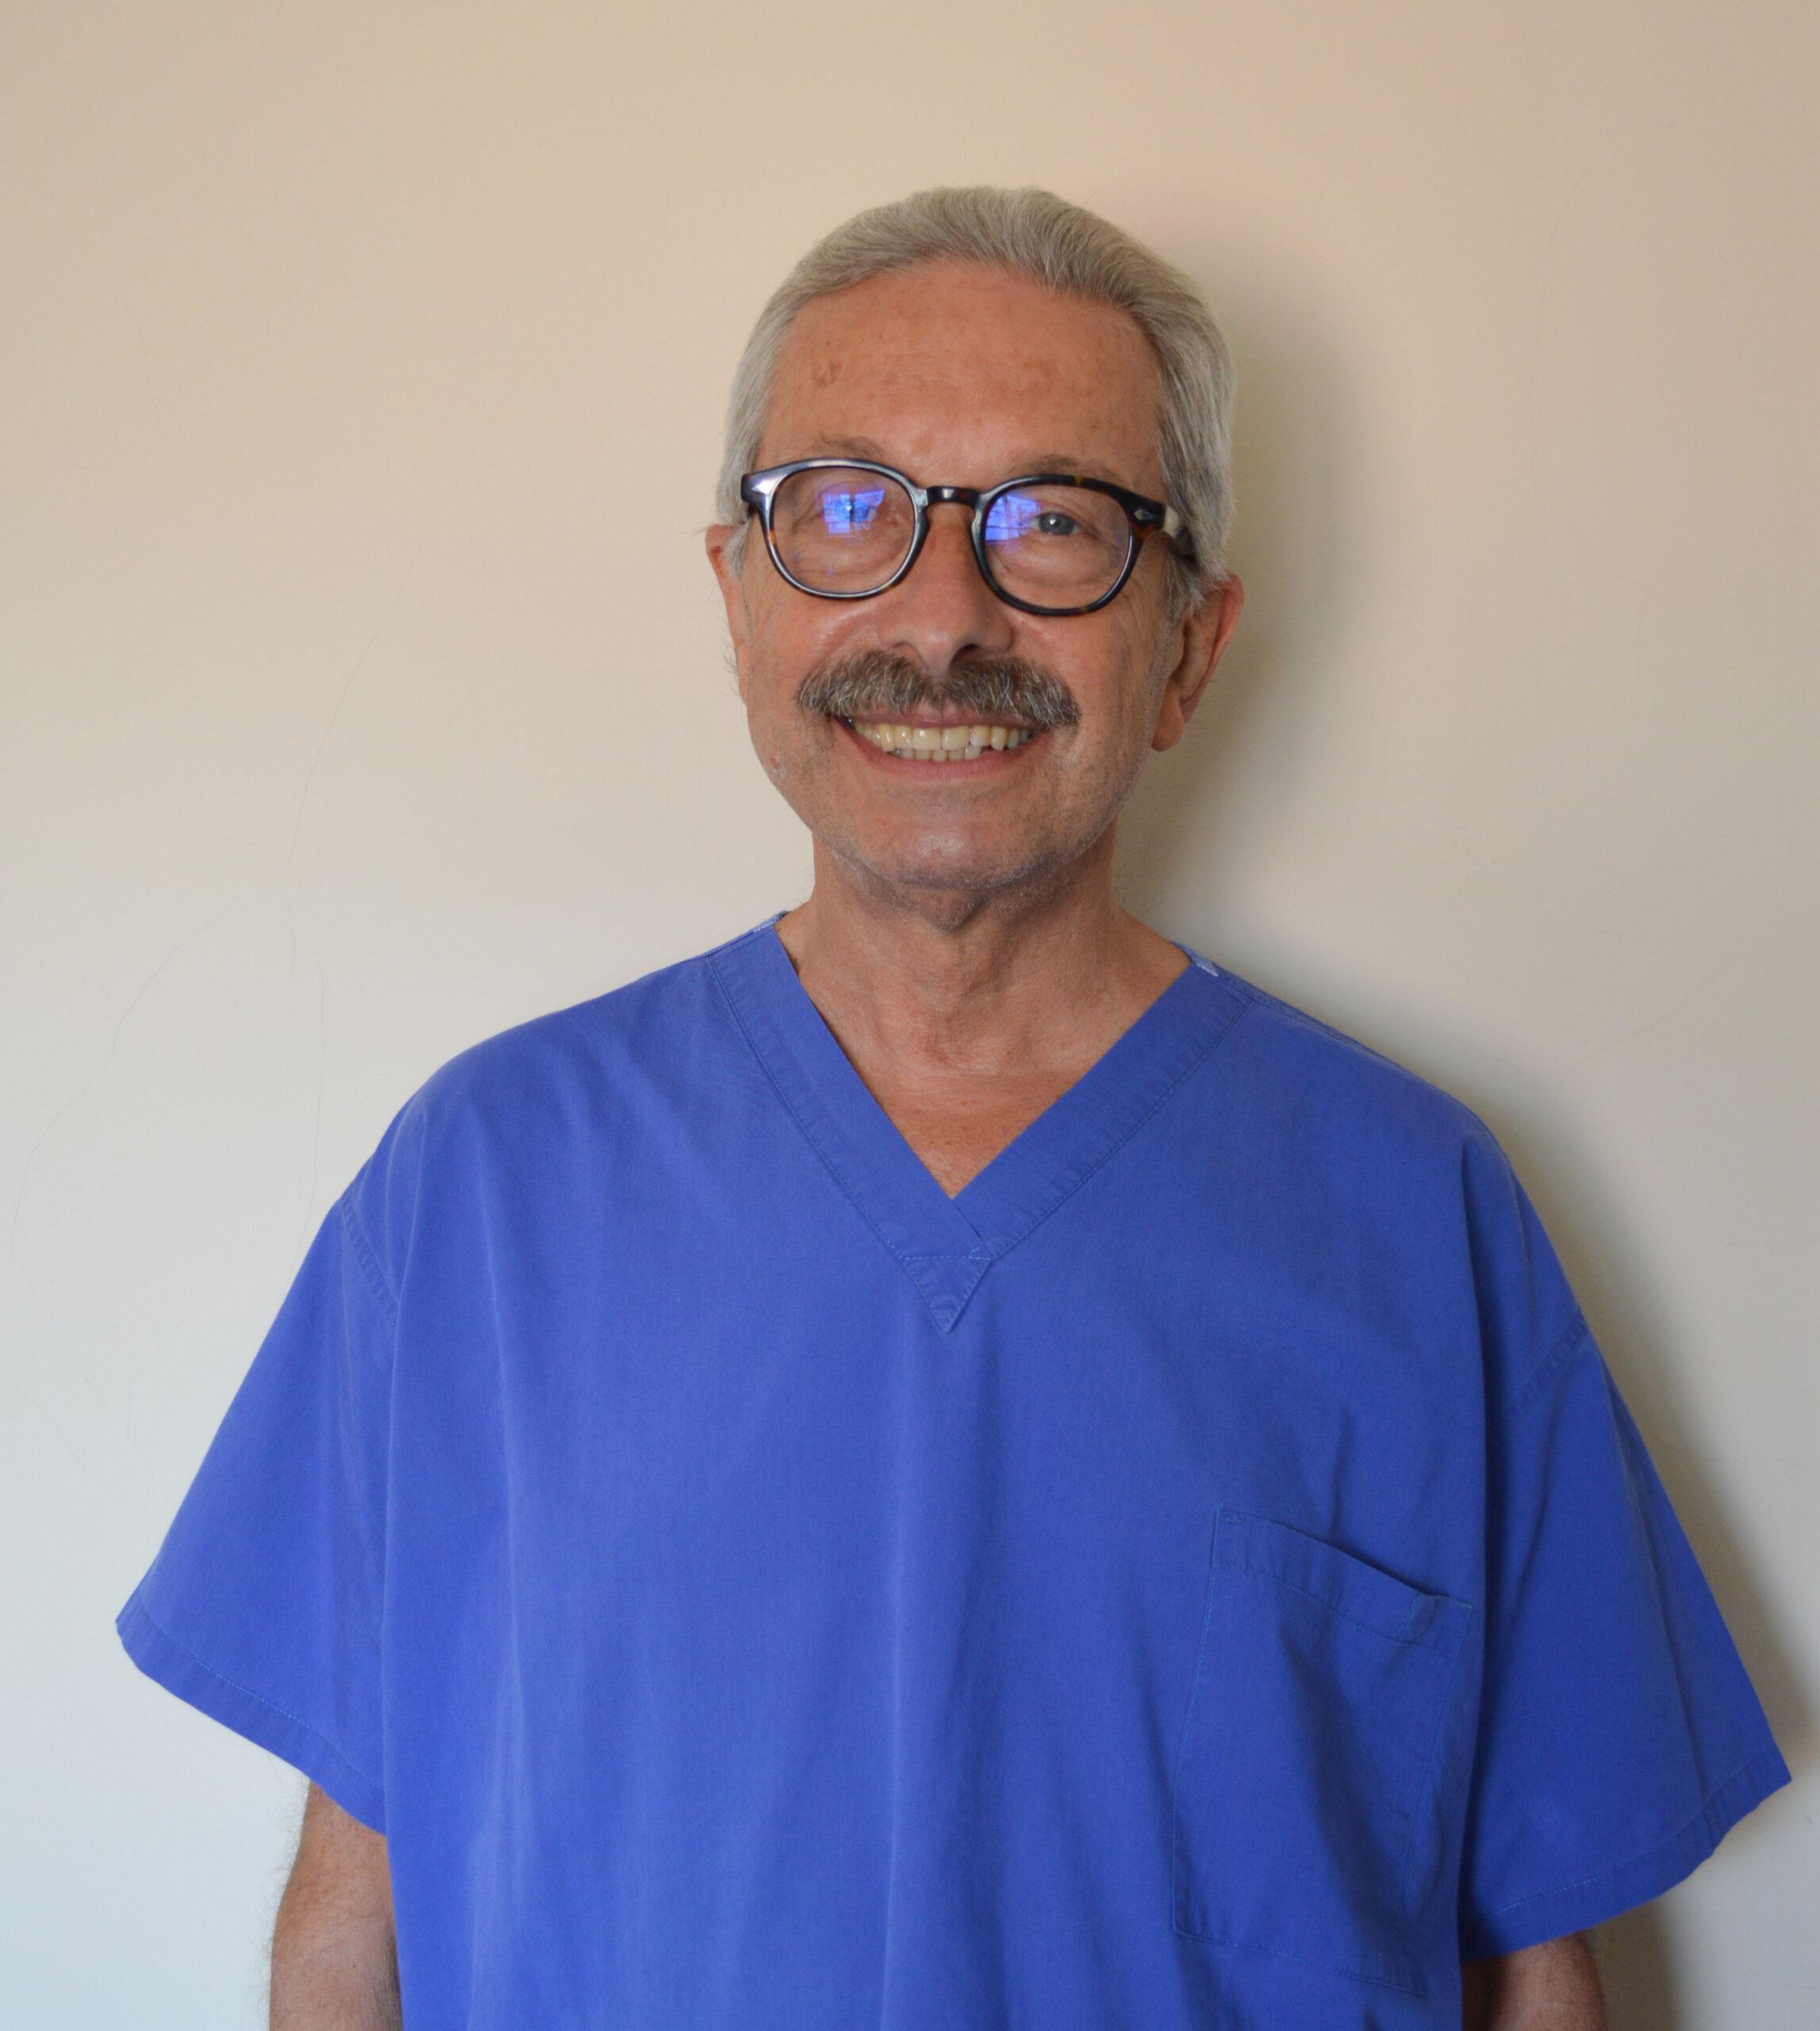 Dott. Antonino Niceforo